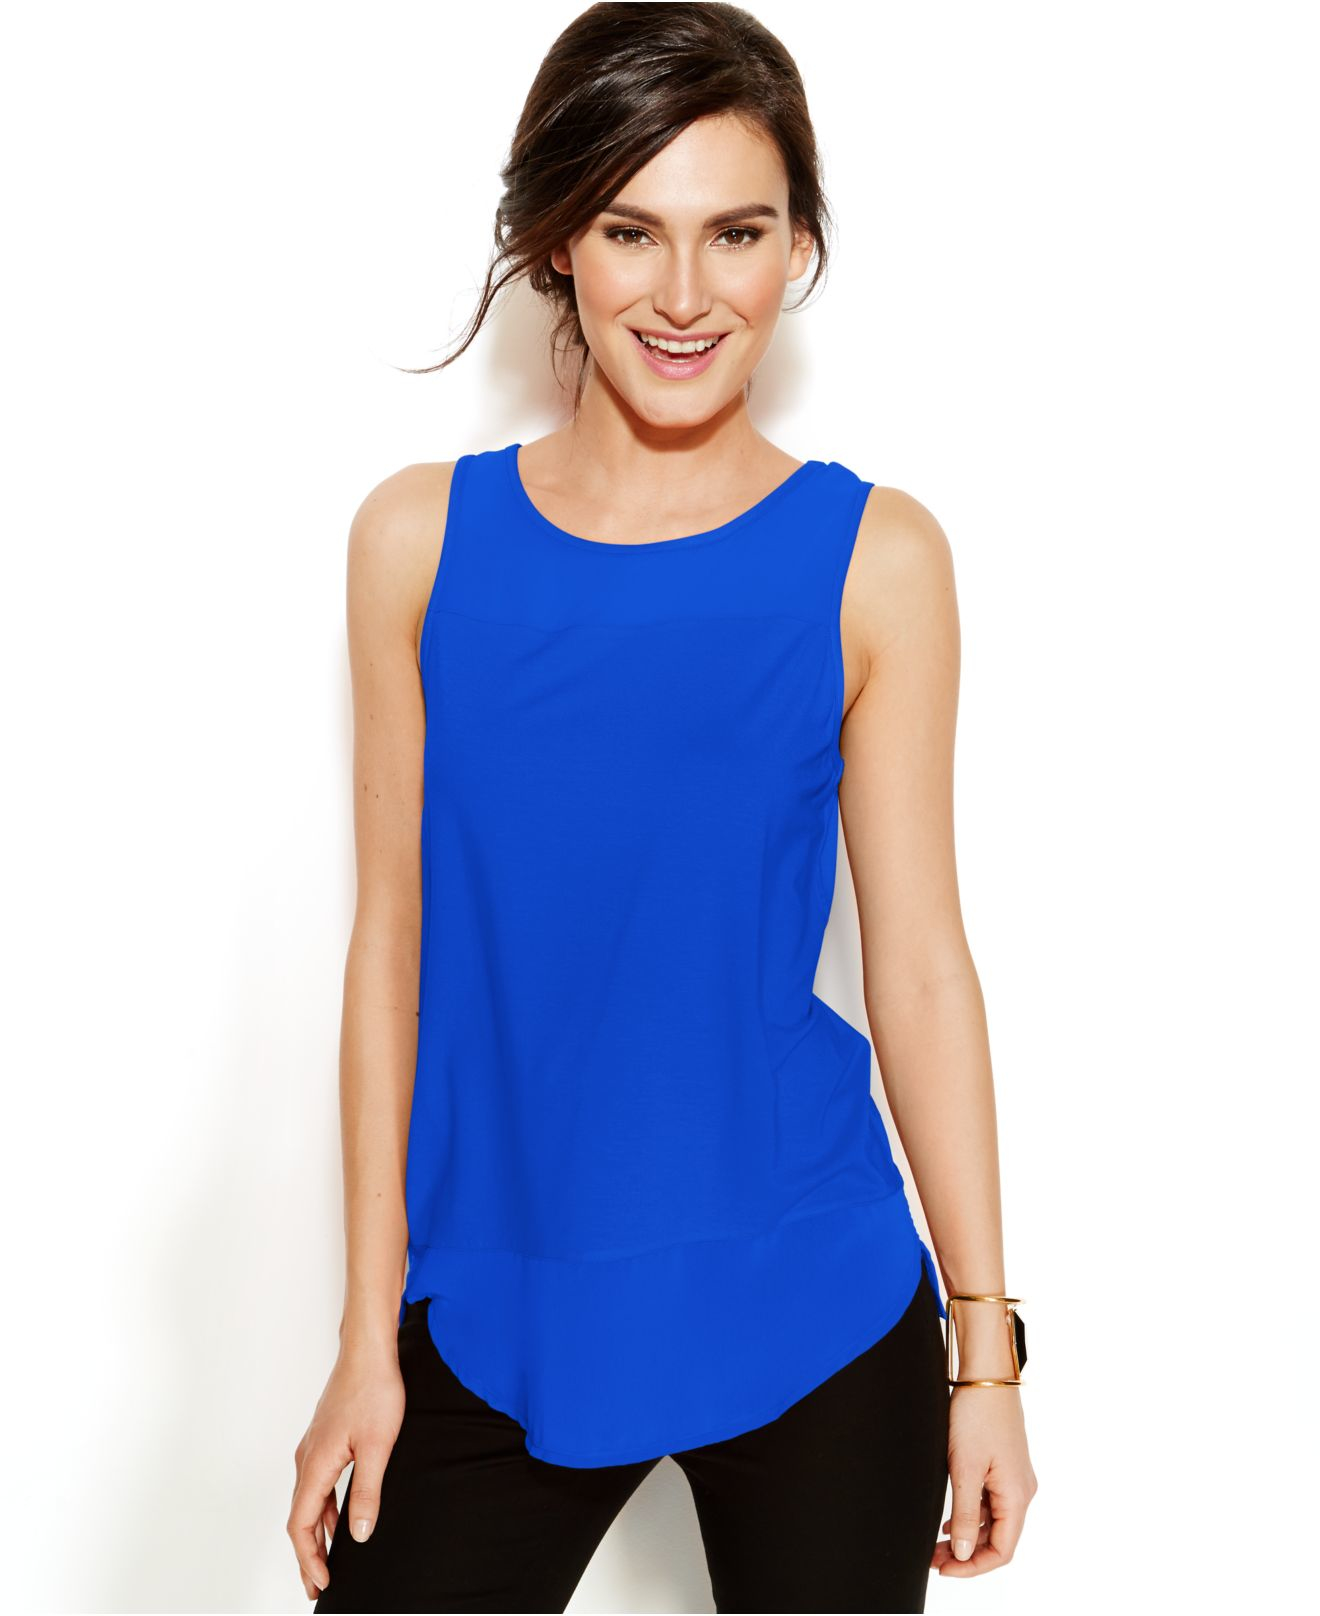 Sleeveless Top - CLOUD BLUE TOPS by VIDA VIDA Cheap Sale Hot Sale bm8zgJls6q